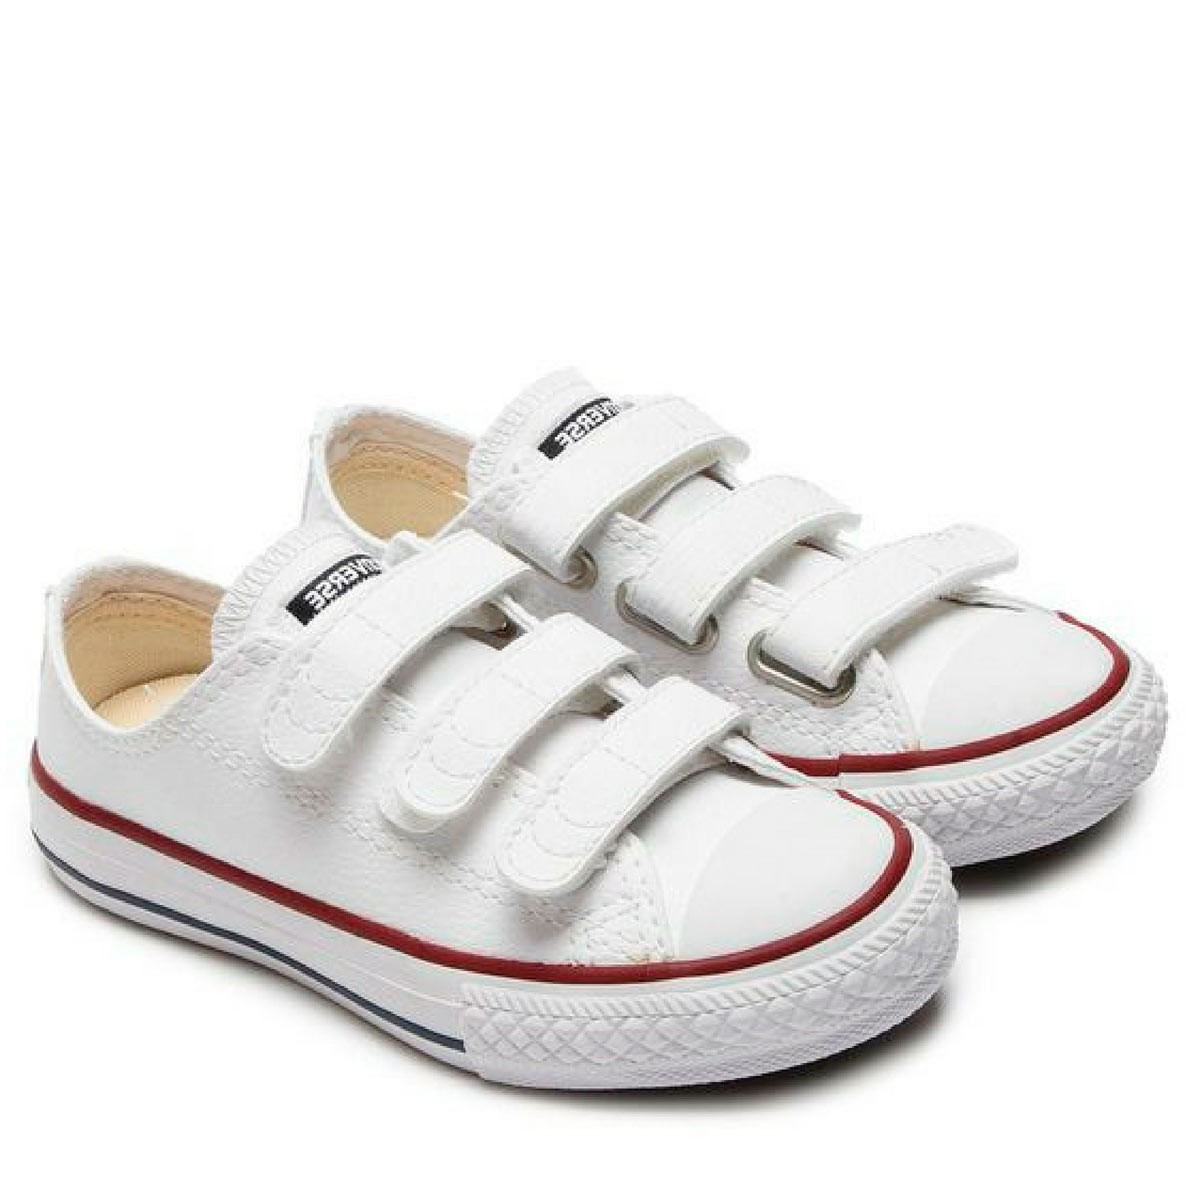 Tenis-Infantil-Chuck-Taylor-AS-3V-SCHOOL-Converse--26-ao-32-